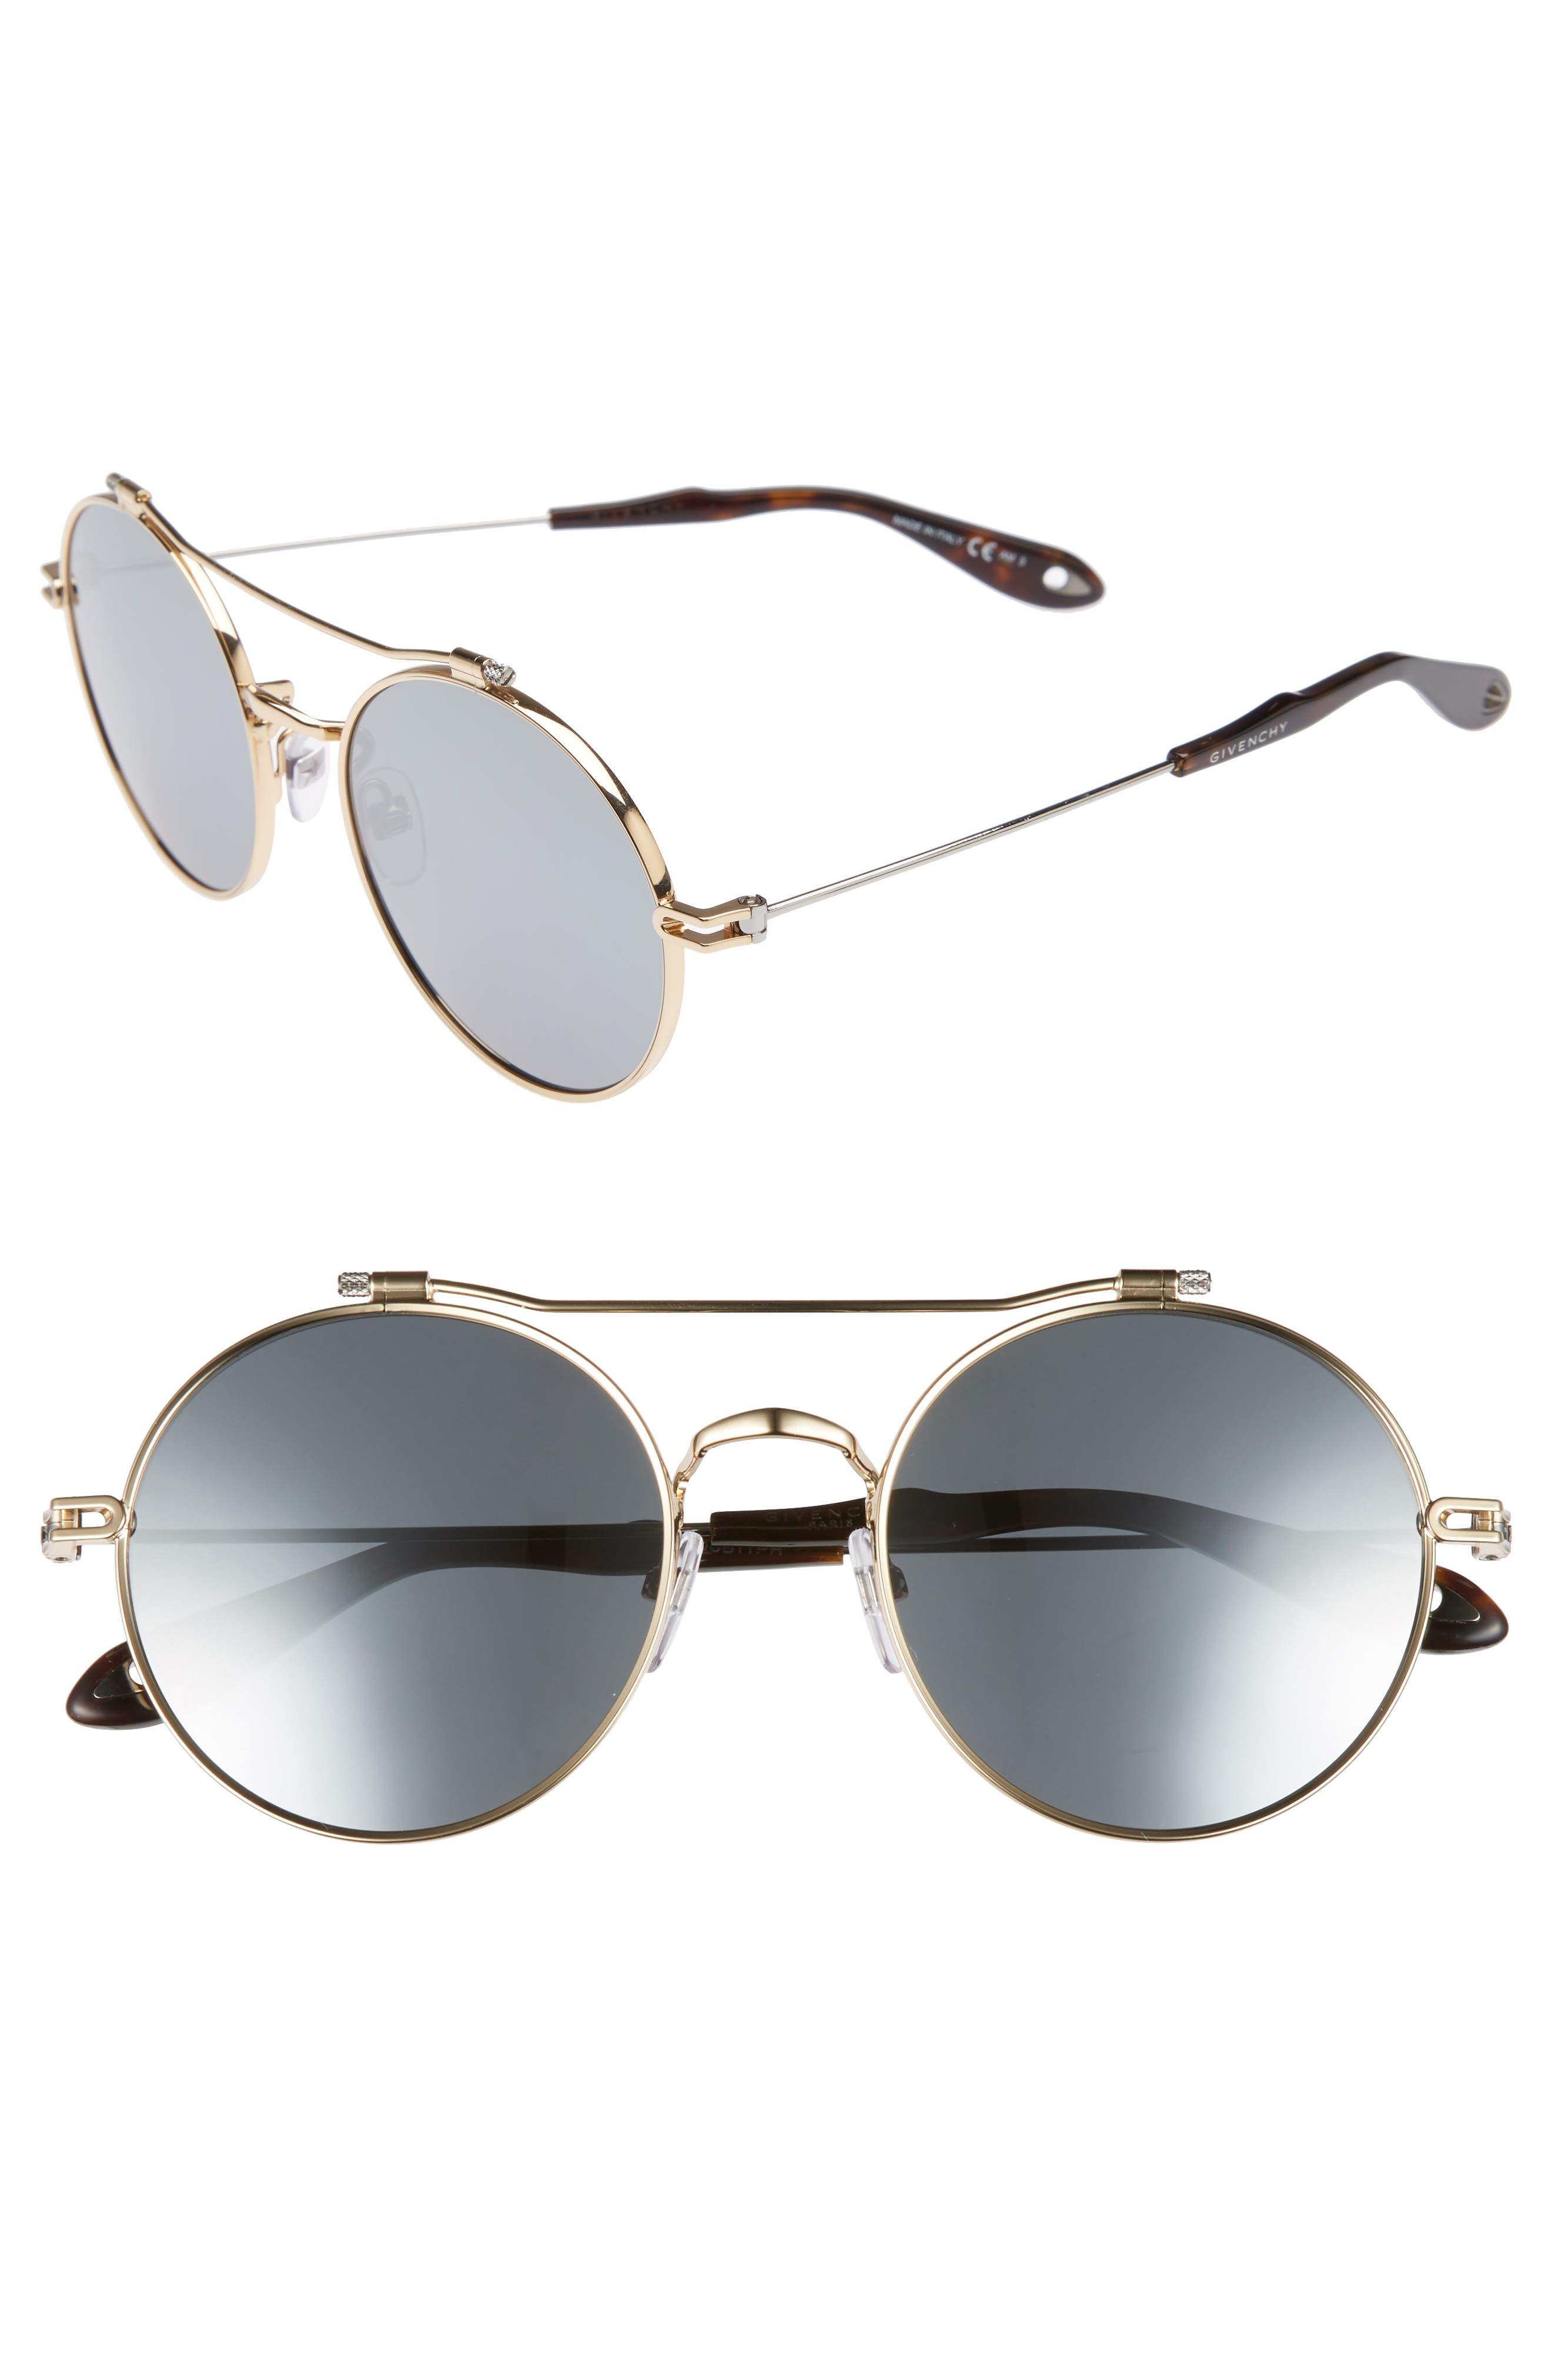 53mm Round Aviator Sunglasses,                             Main thumbnail 1, color,                             Gold Ruthenium/ Black Mirror